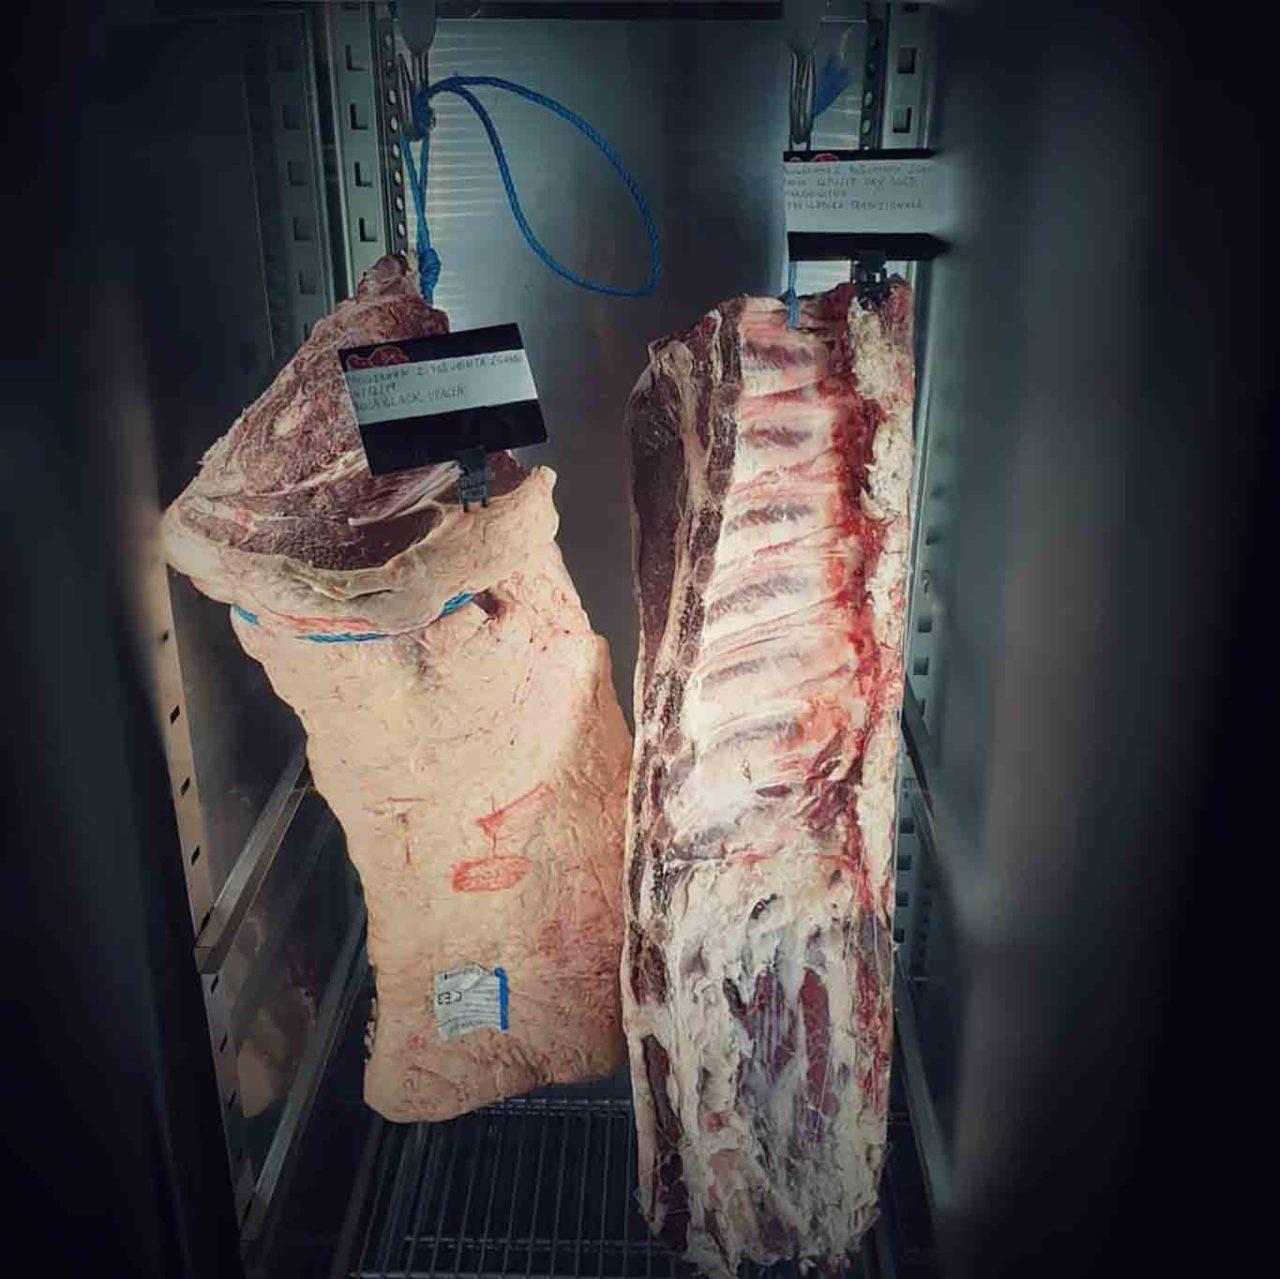 bistecca e frollatura dry aged